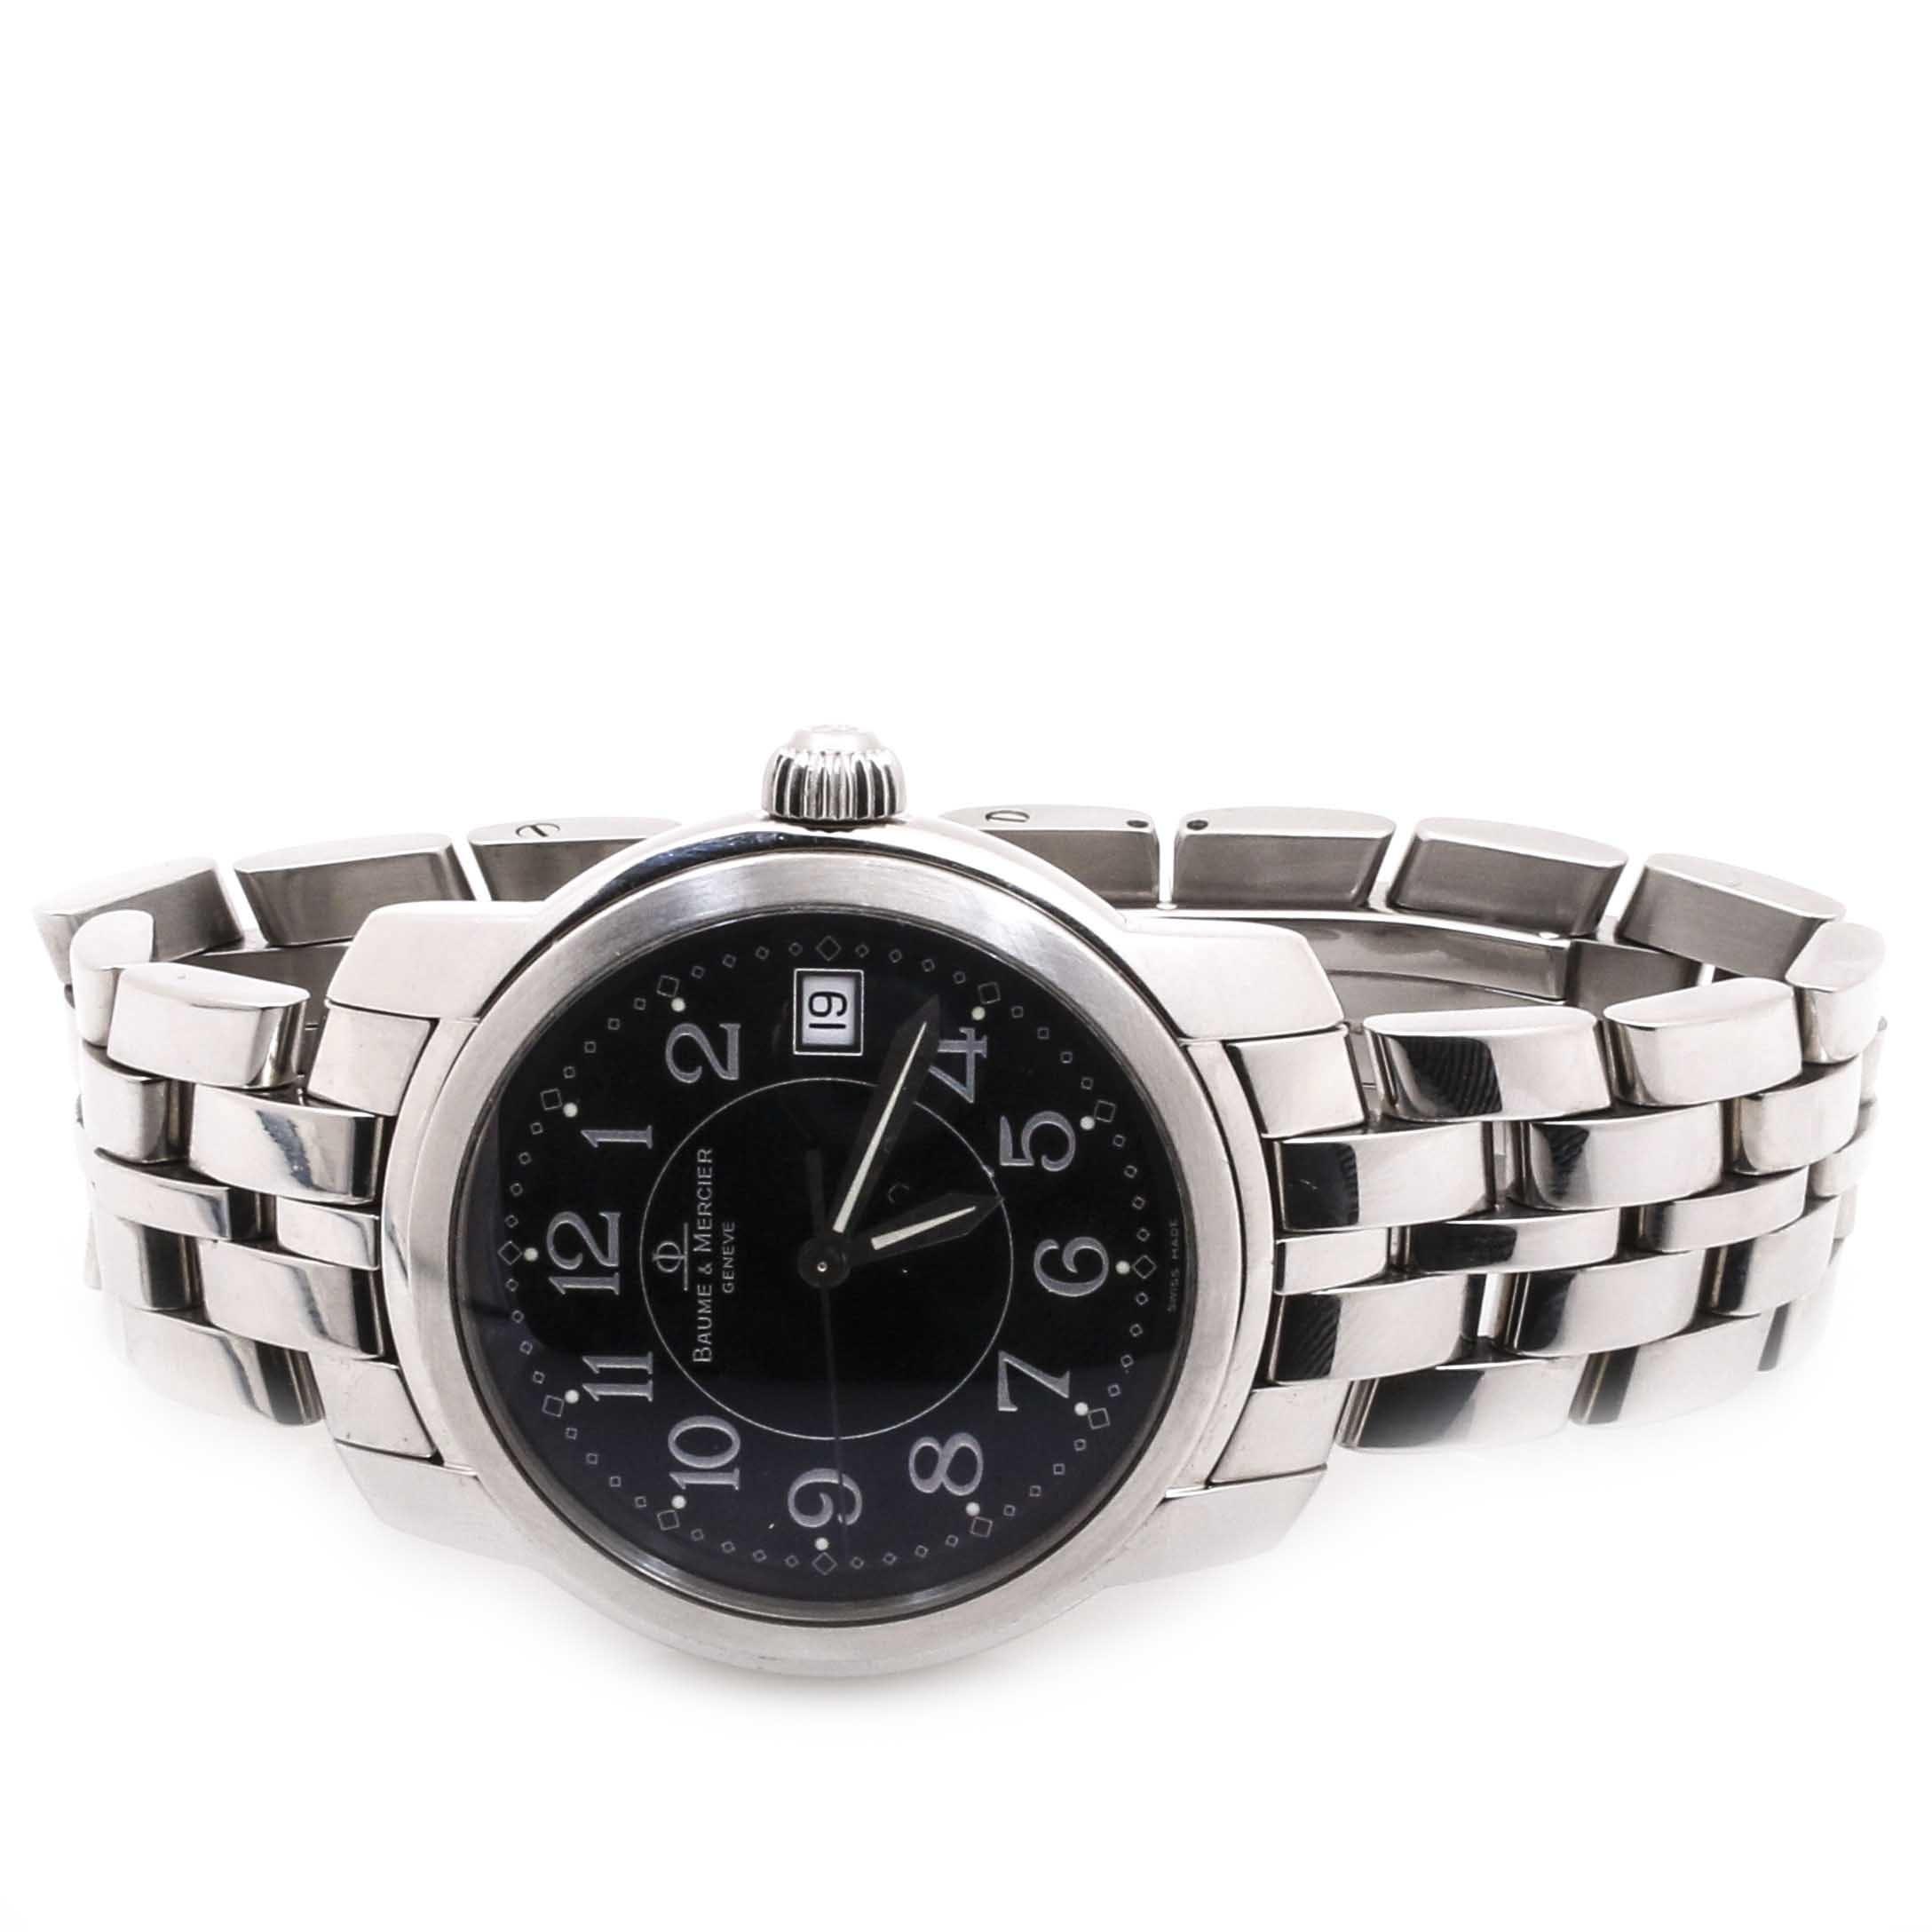 Stainless Steel Baume & Mercier Geneve Wristwatch